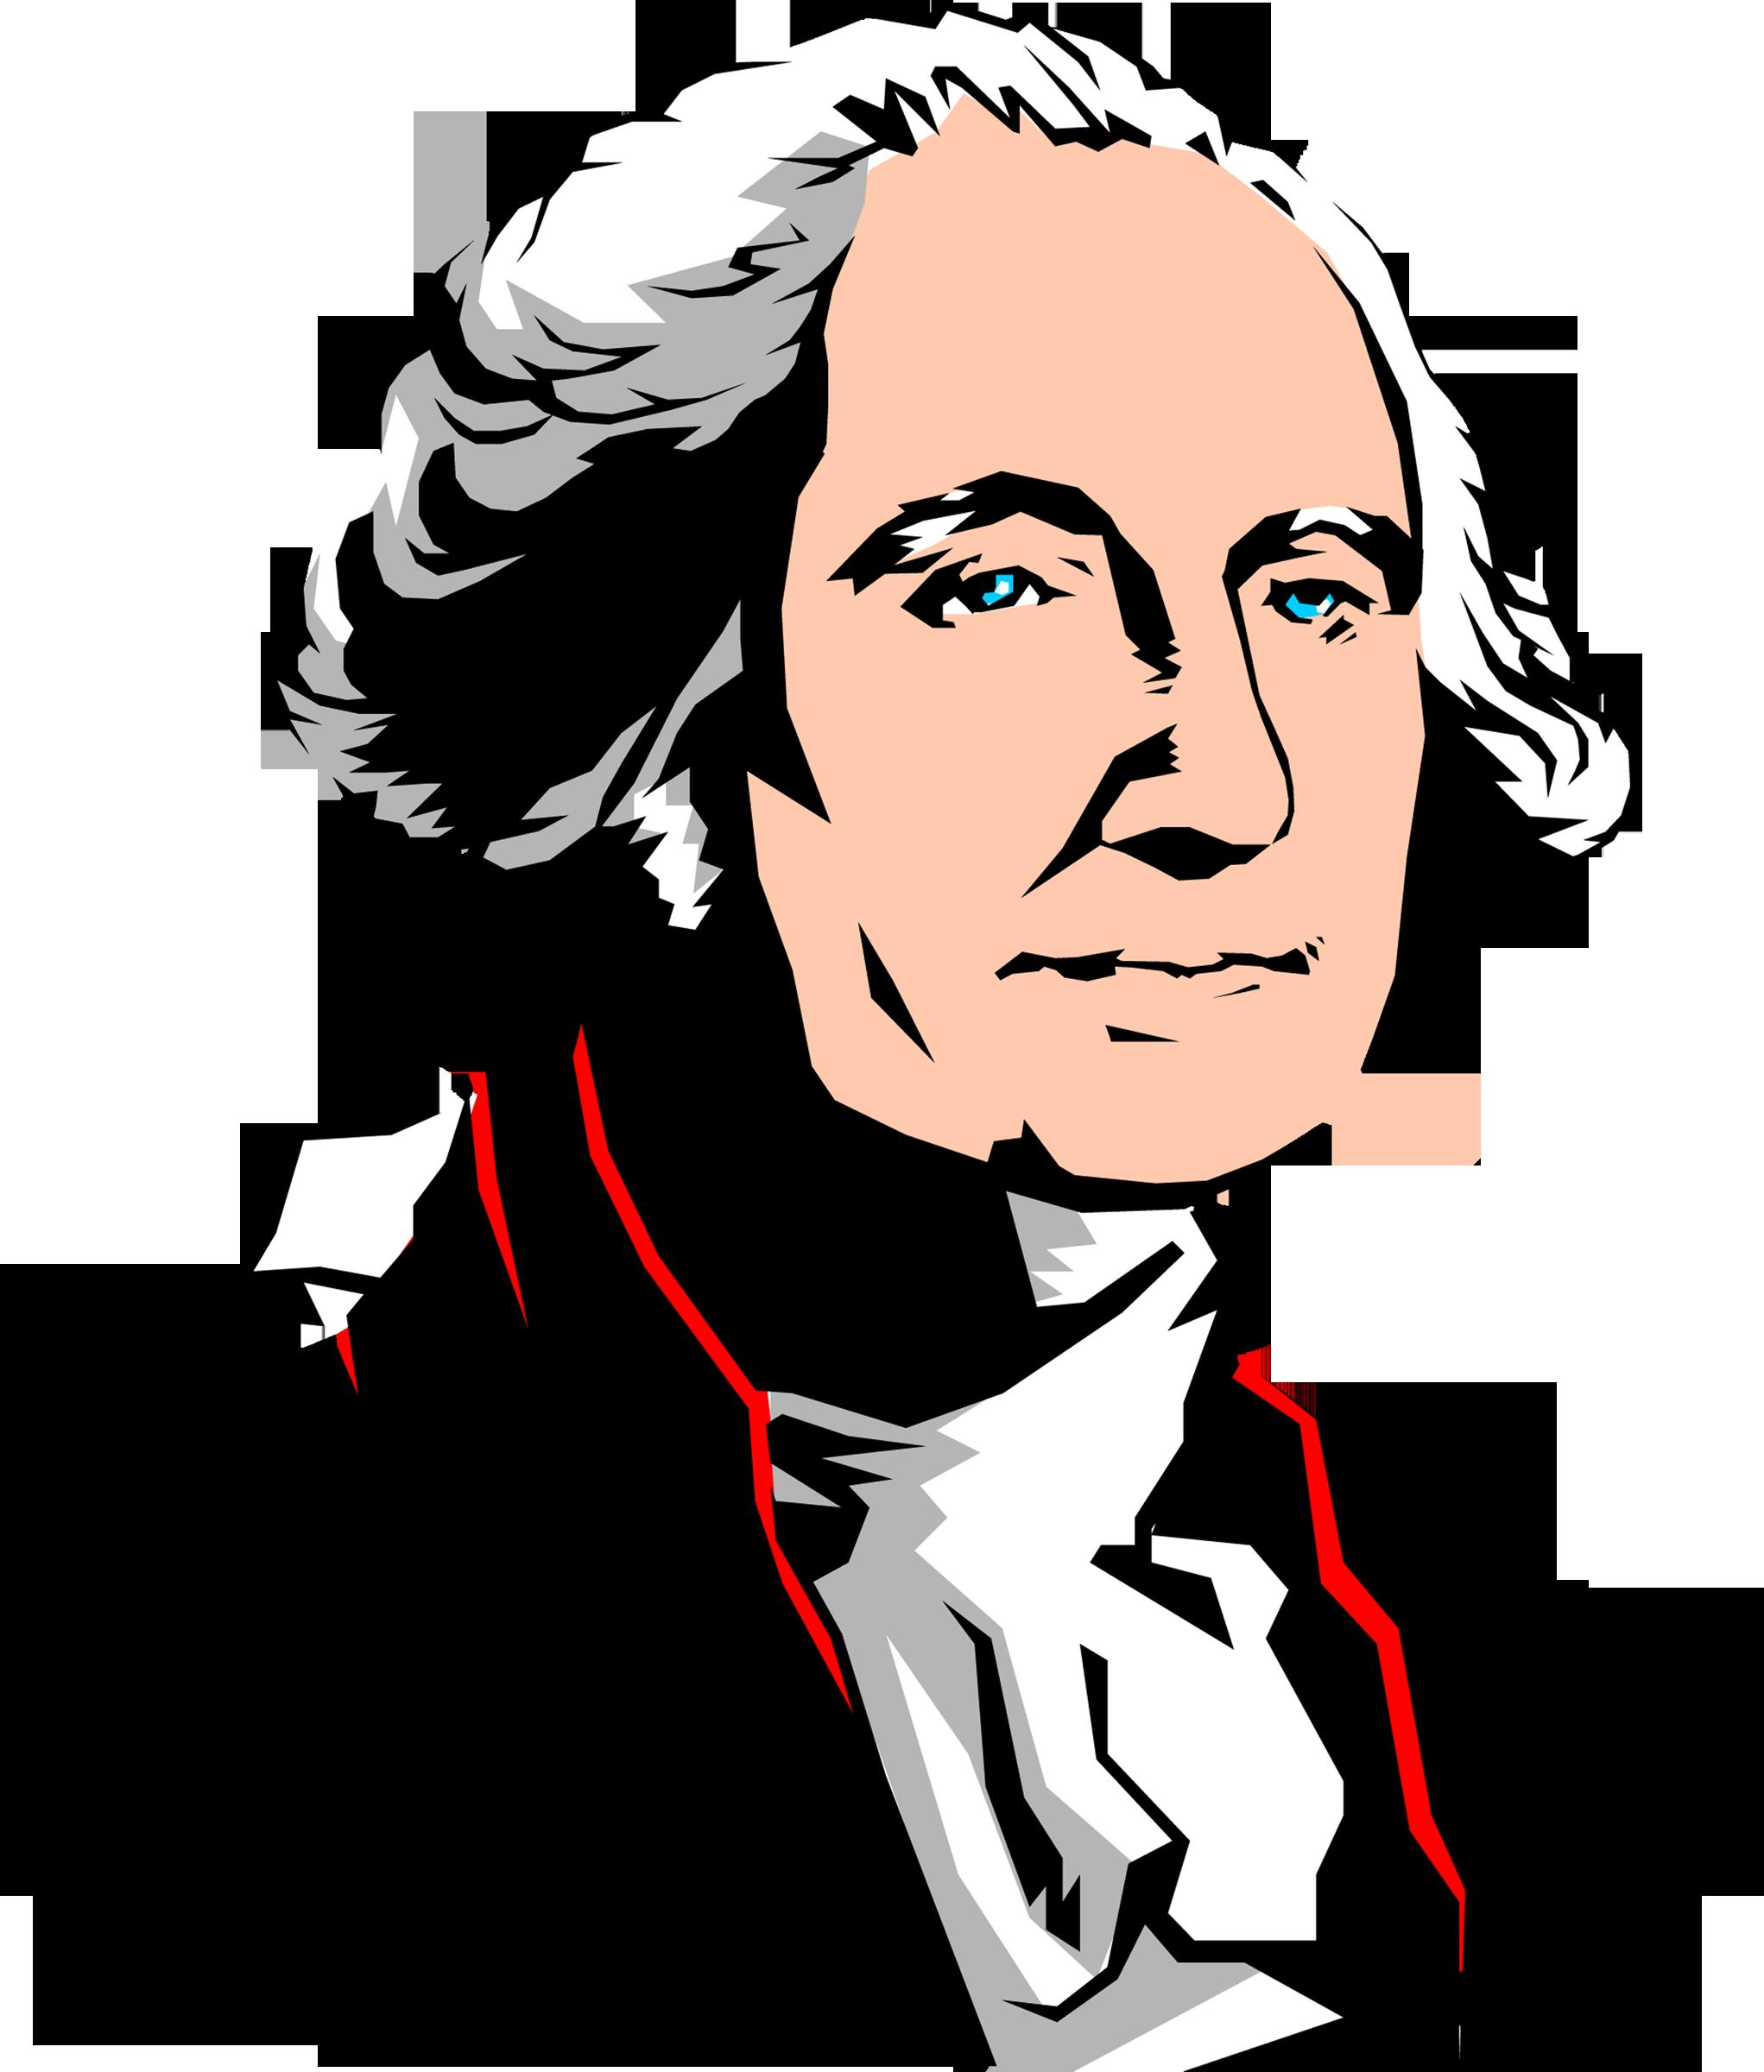 George washington cherry tree clipart picture free download George Washington Cartoon Drawing at GetDrawings.com | Free for ... picture free download